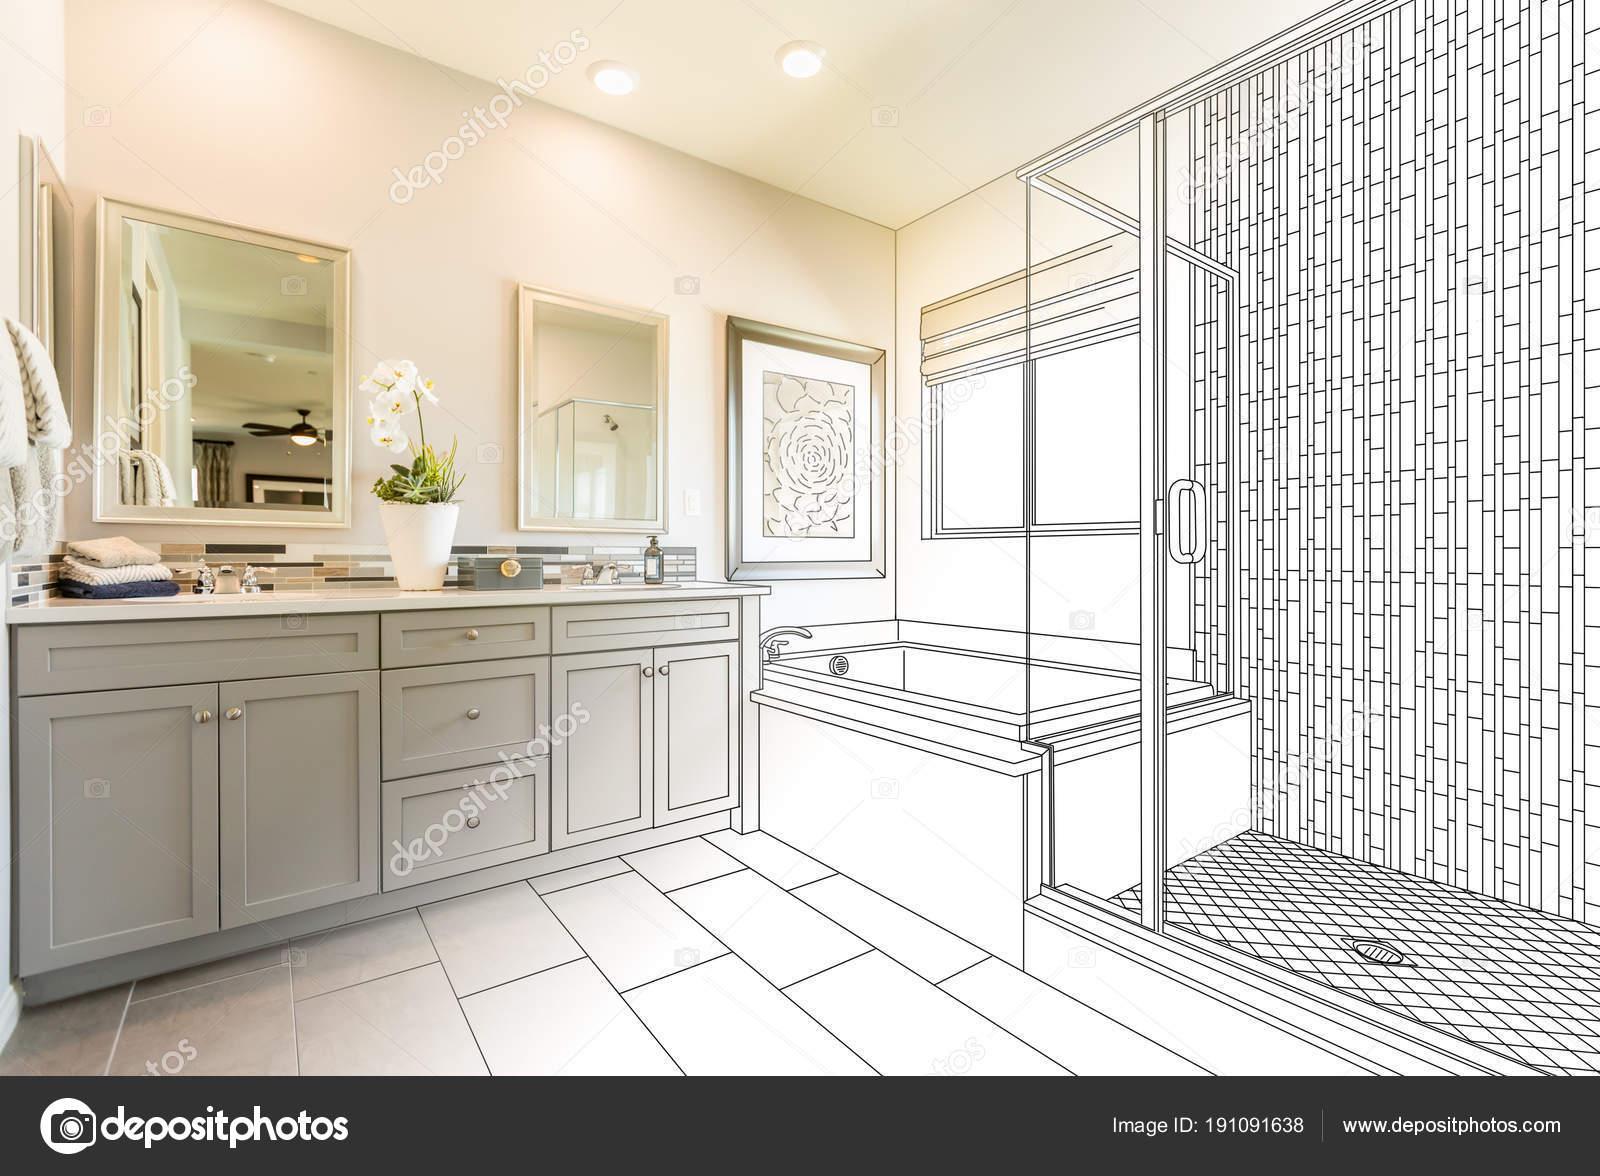 Aangepaste Master badkamer ontwerp tekening Gradating aan klaar foto ...